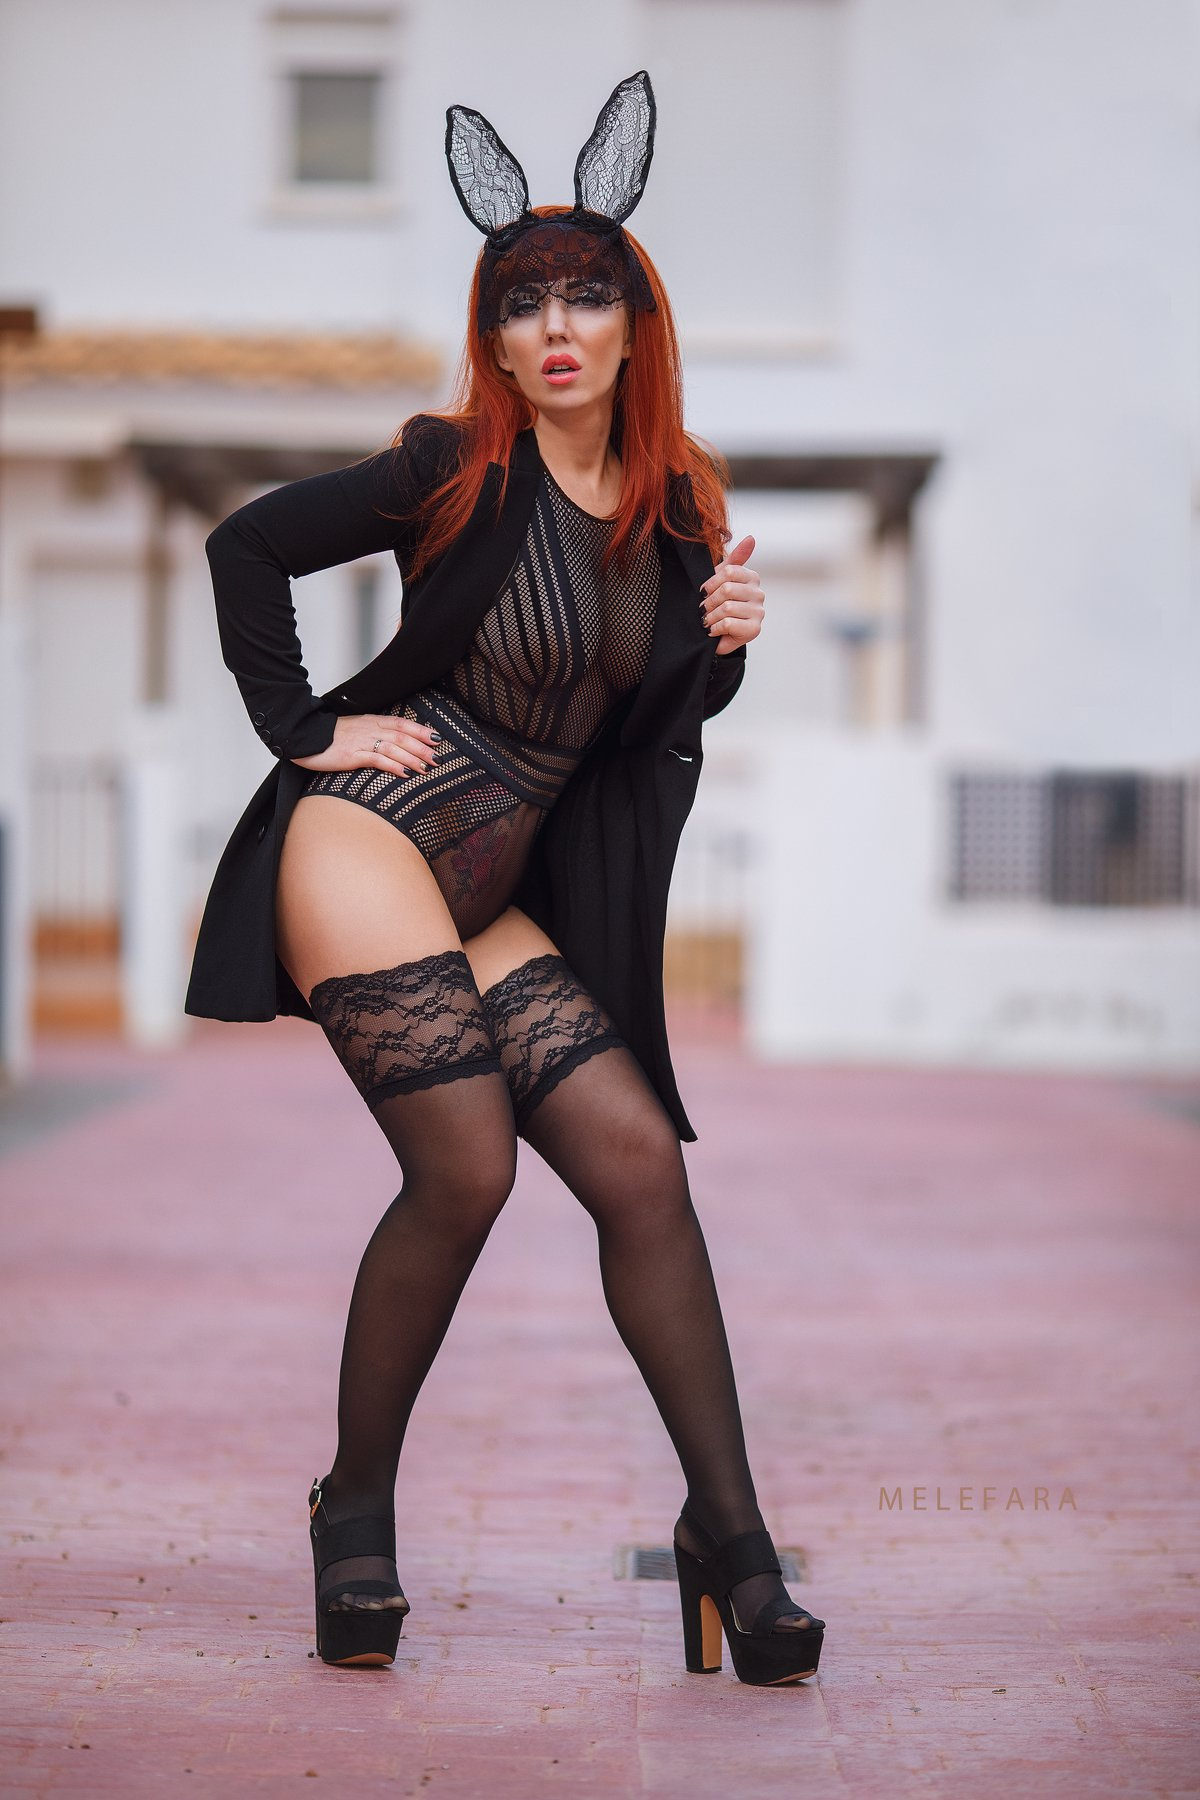 nude,эротика, красотки, erotic,beautiful, Сергей Мелефара